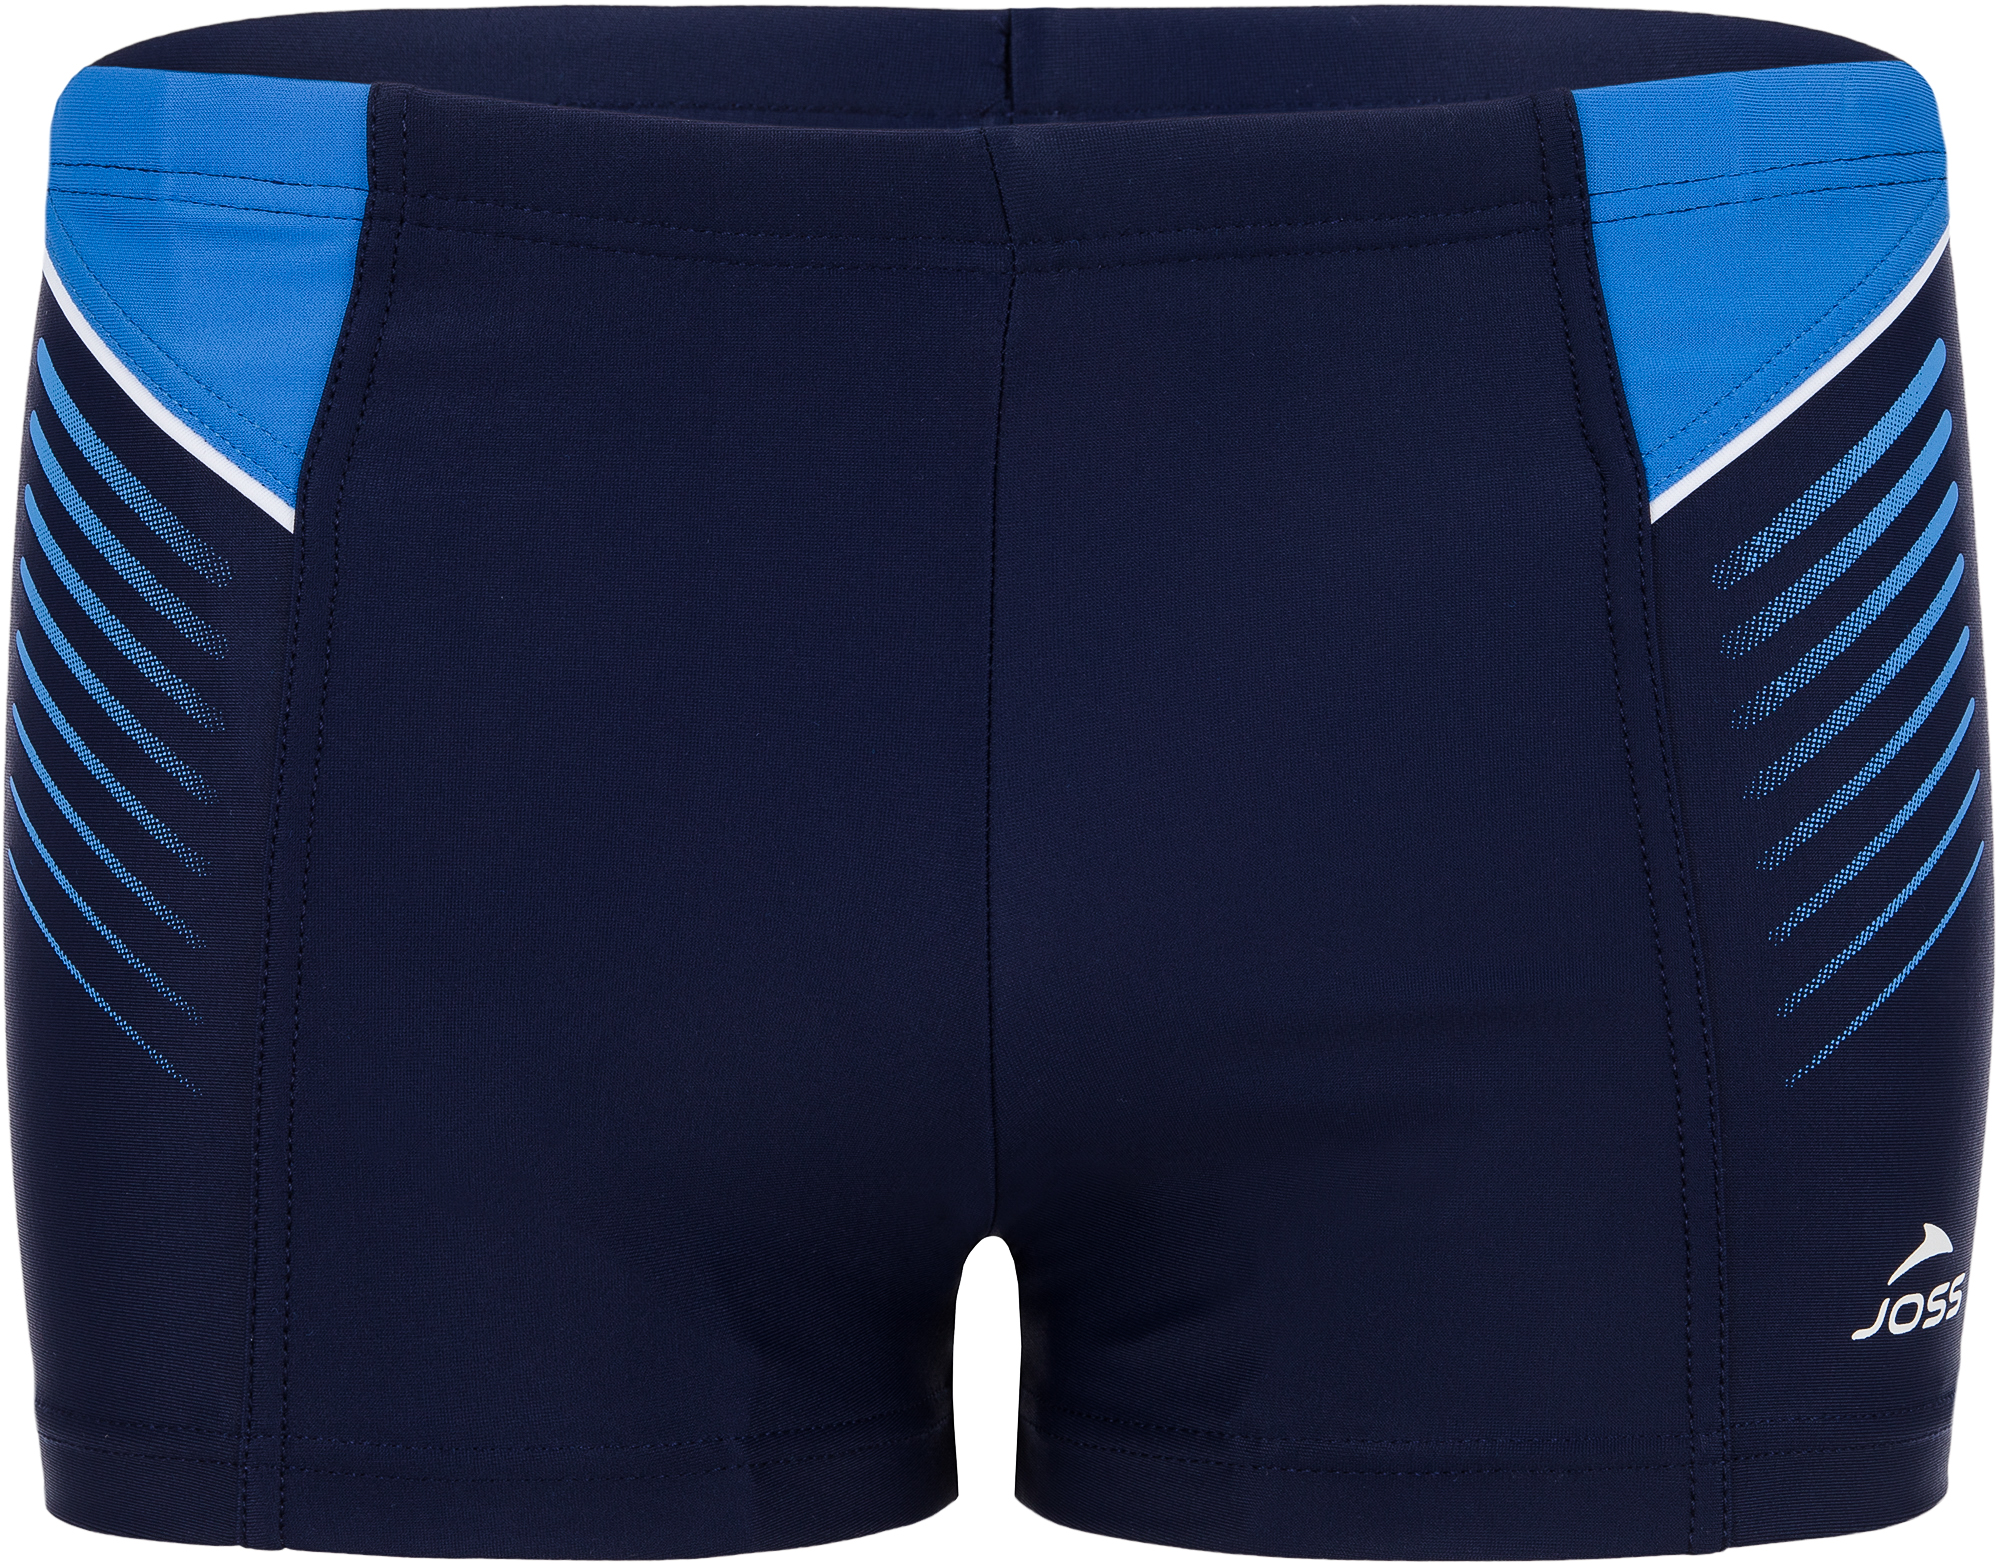 Joss Плавки-шорты для мальчиков Joss, размер 164